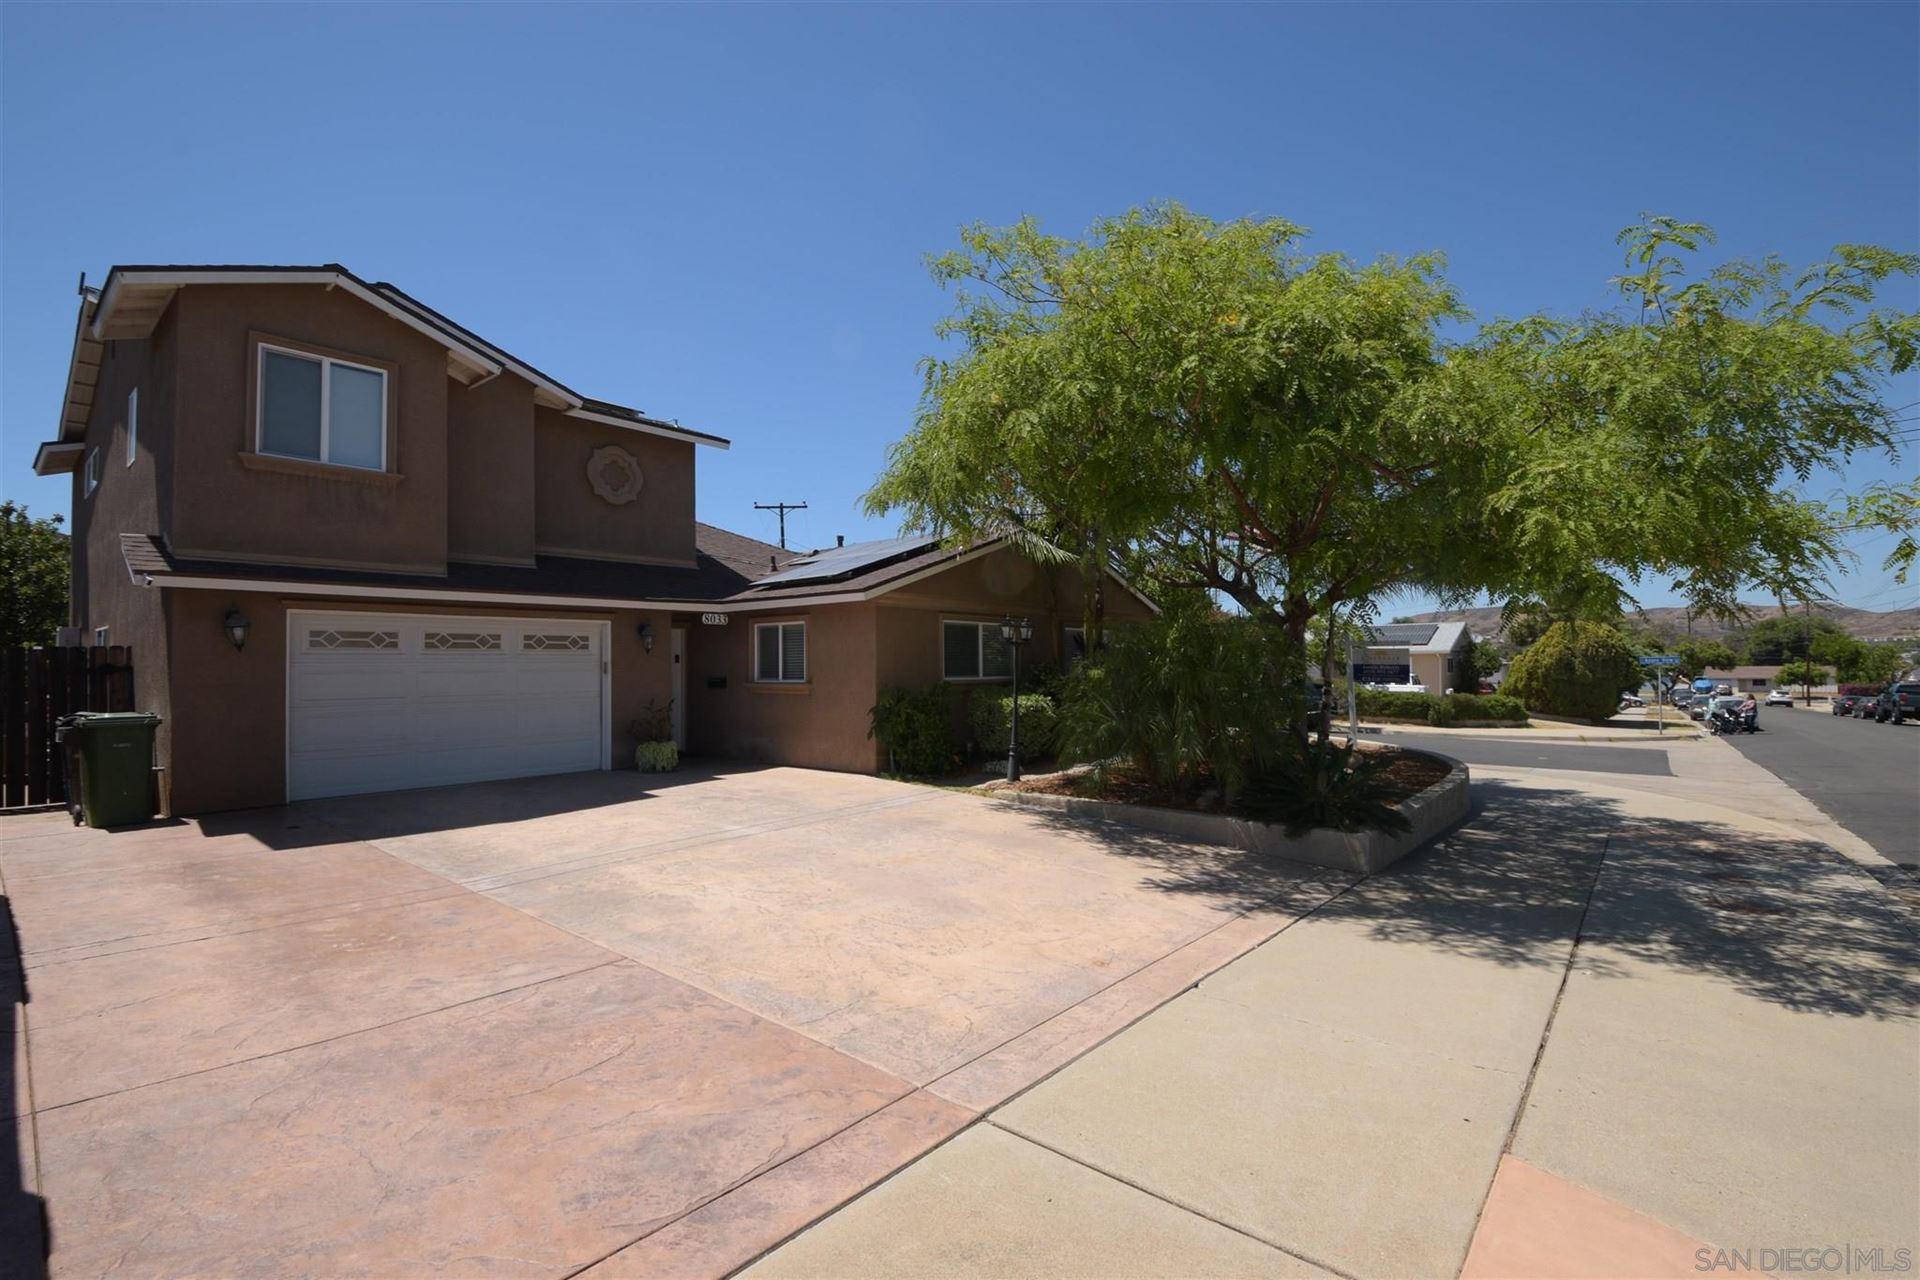 Photo of 8033 AZURE VIEW, SANTEE, CA 92071 (MLS # 210015928)